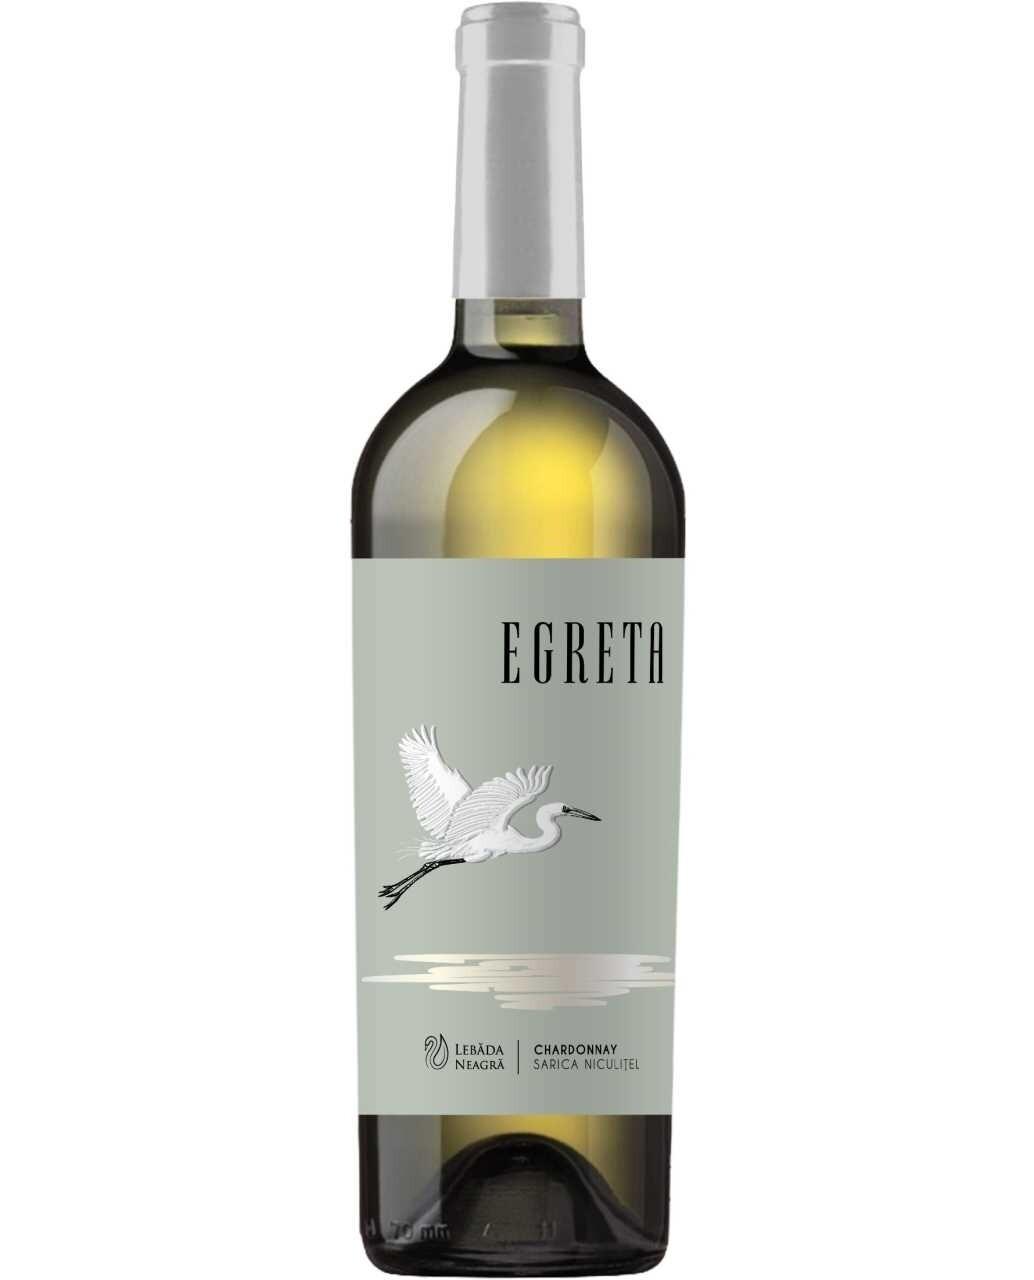 Lebada Neagra Egreta Chardonnay Sec